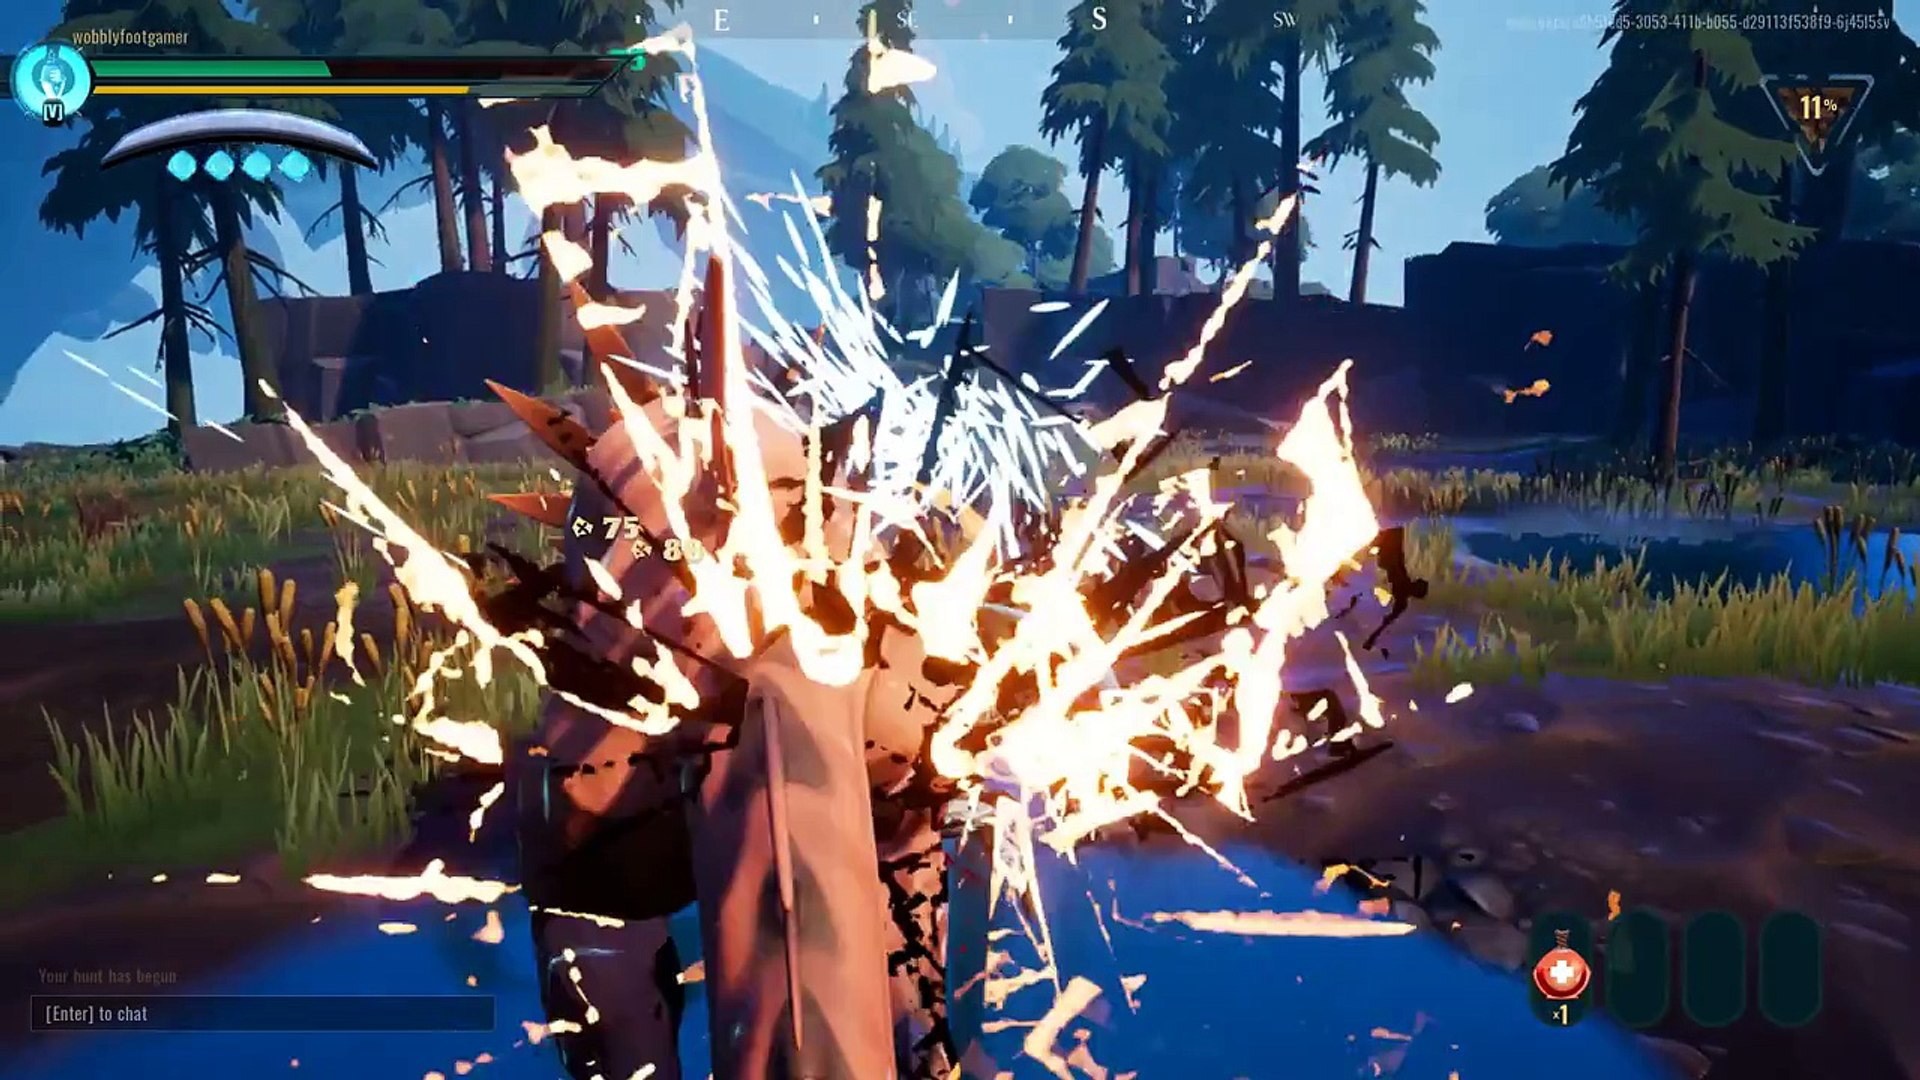 wobblyfootgamer  Dauntless  Part 4  Glowing Embers  Defeat Rogue Embermane